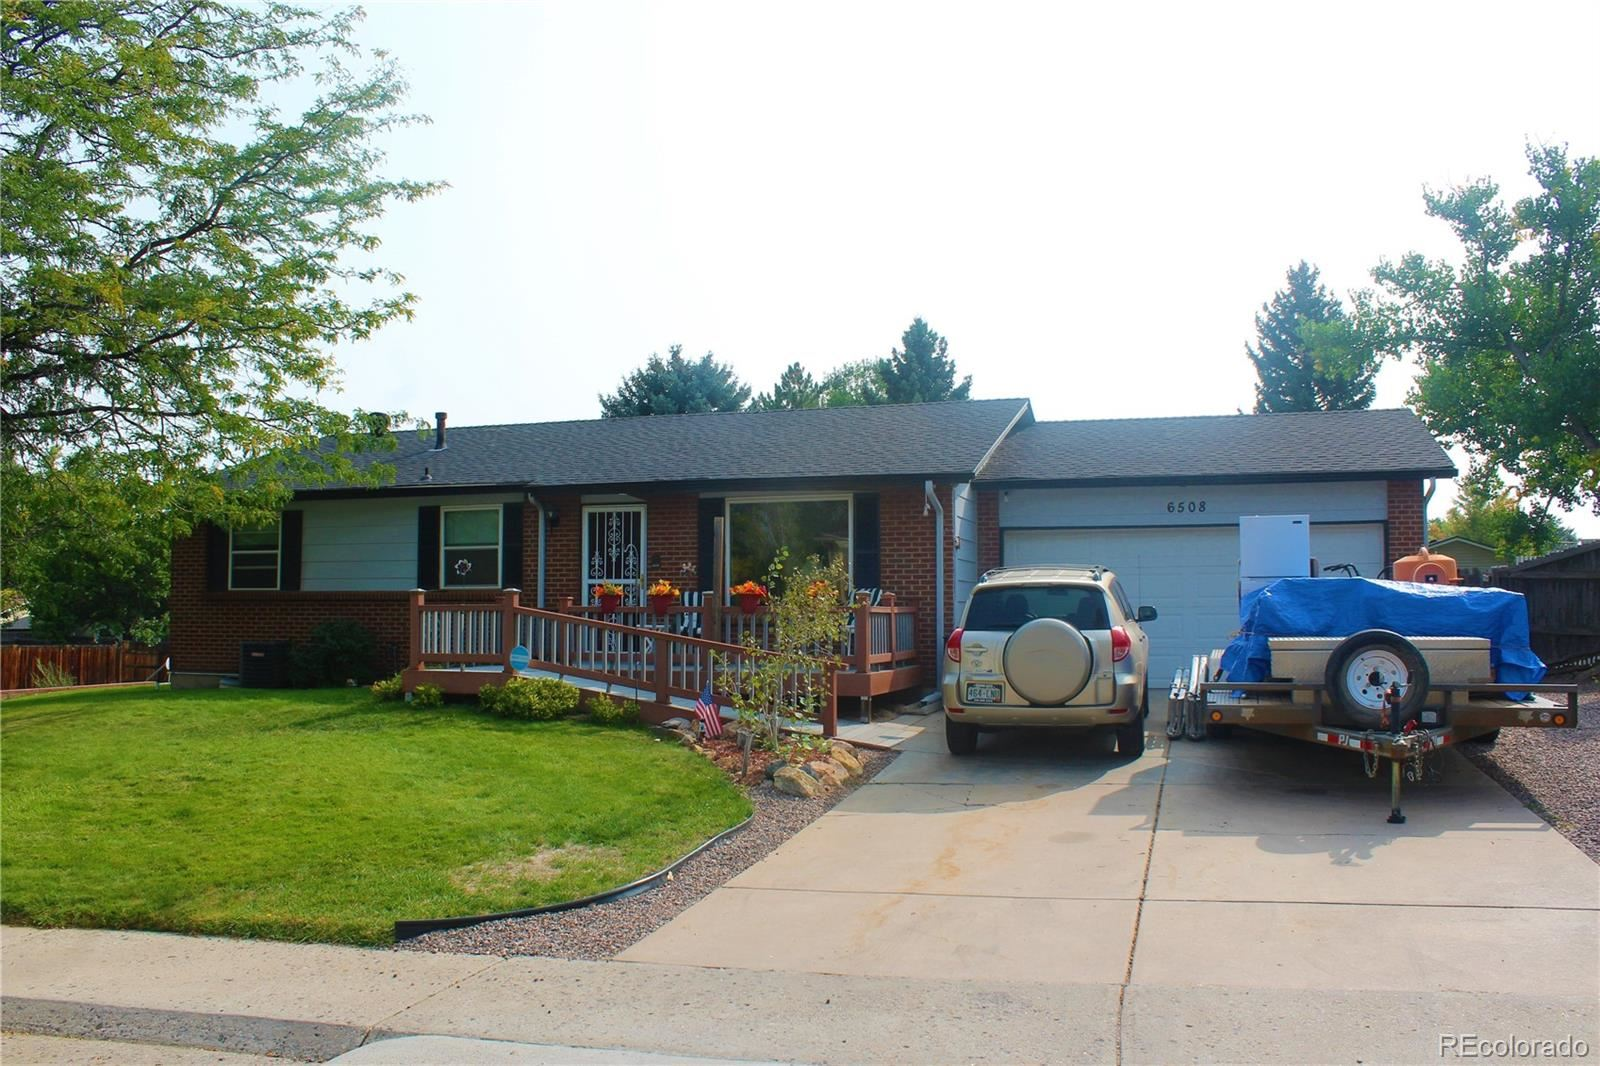 6508 S Everett Way, Littleton, CO 80123 - MLS#: 6606090